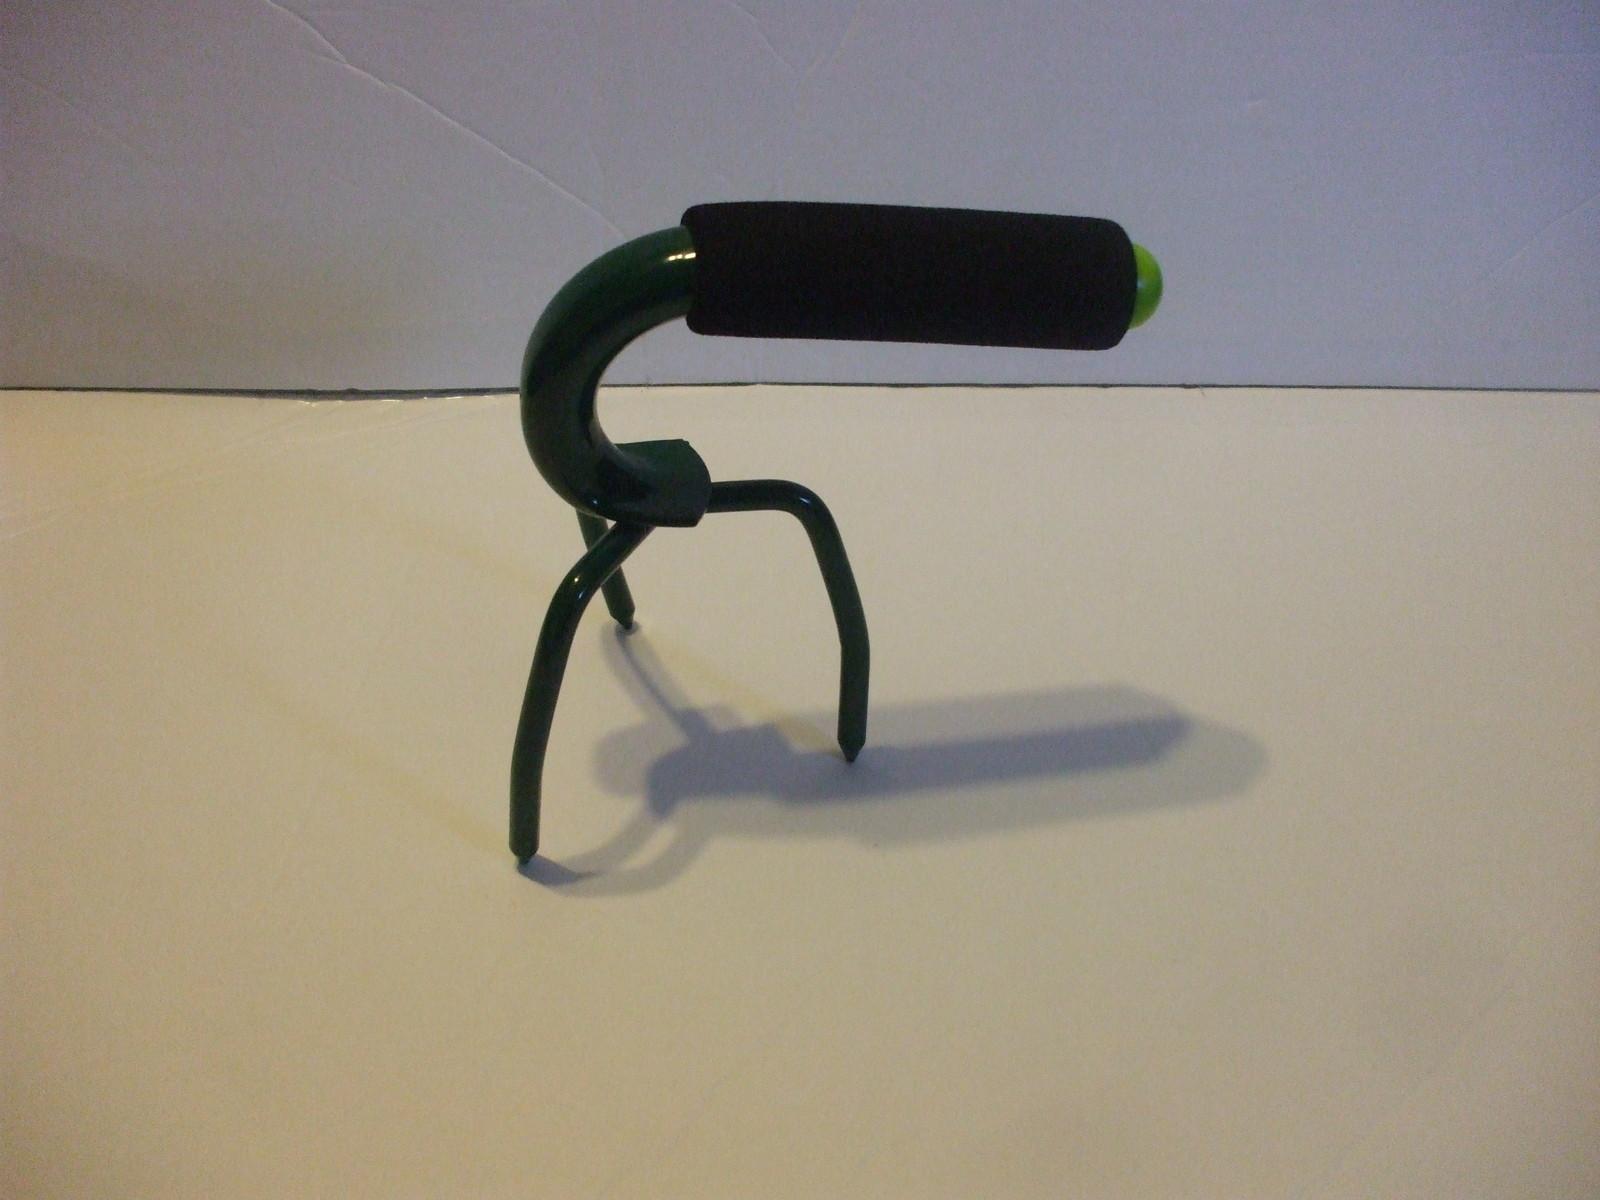 Garden Claw Cultivator Green Mini Hand Held